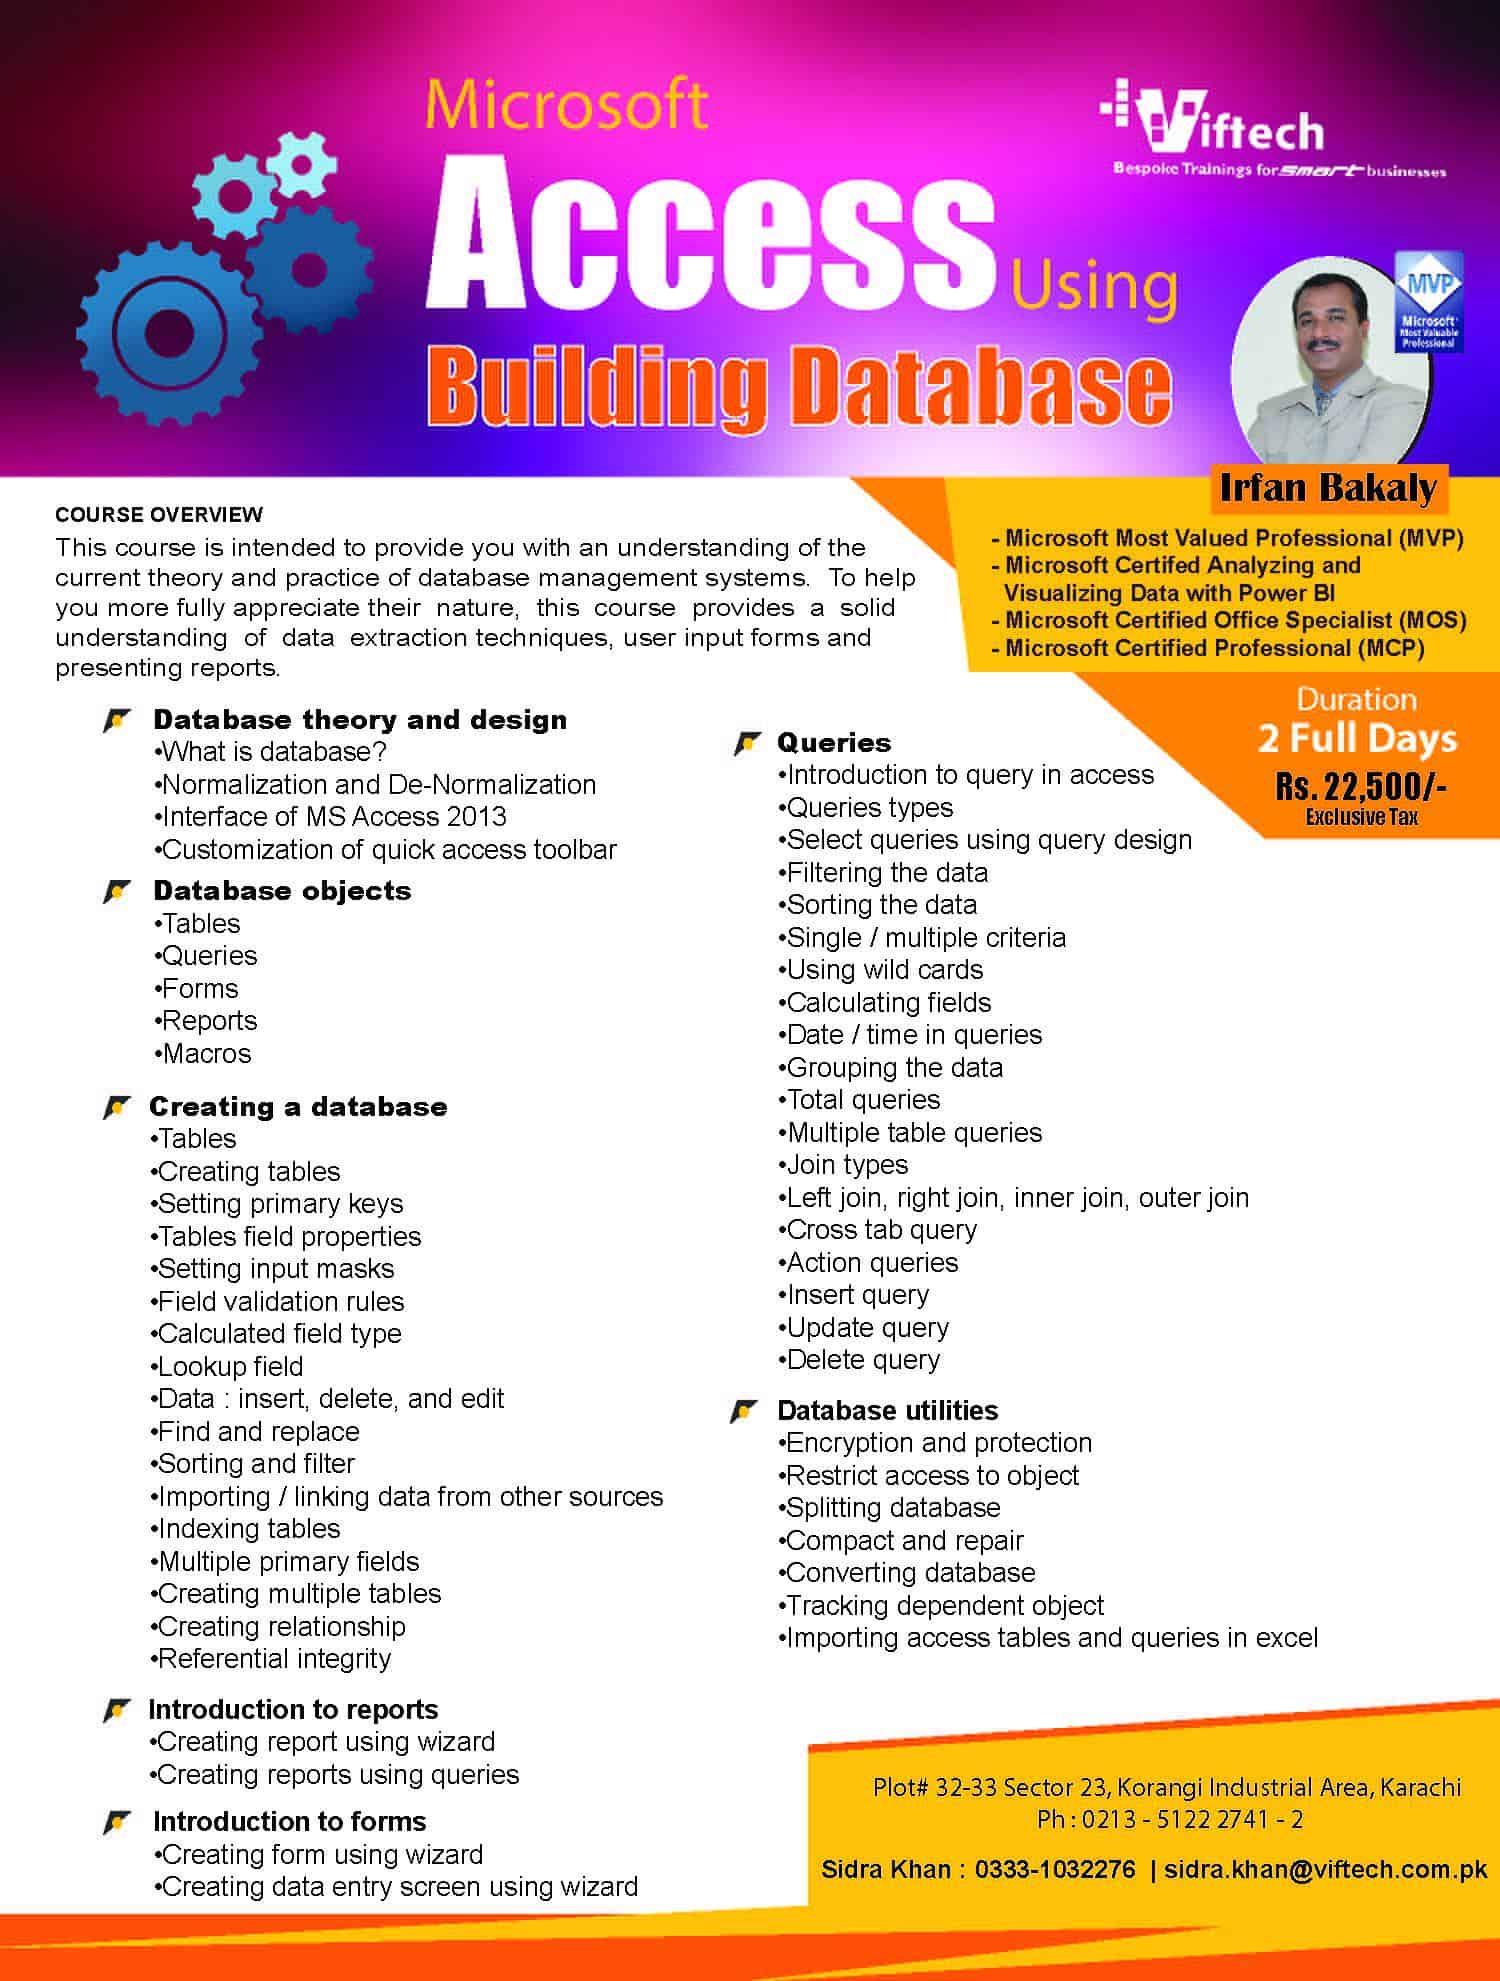 MS Access 2013/2016